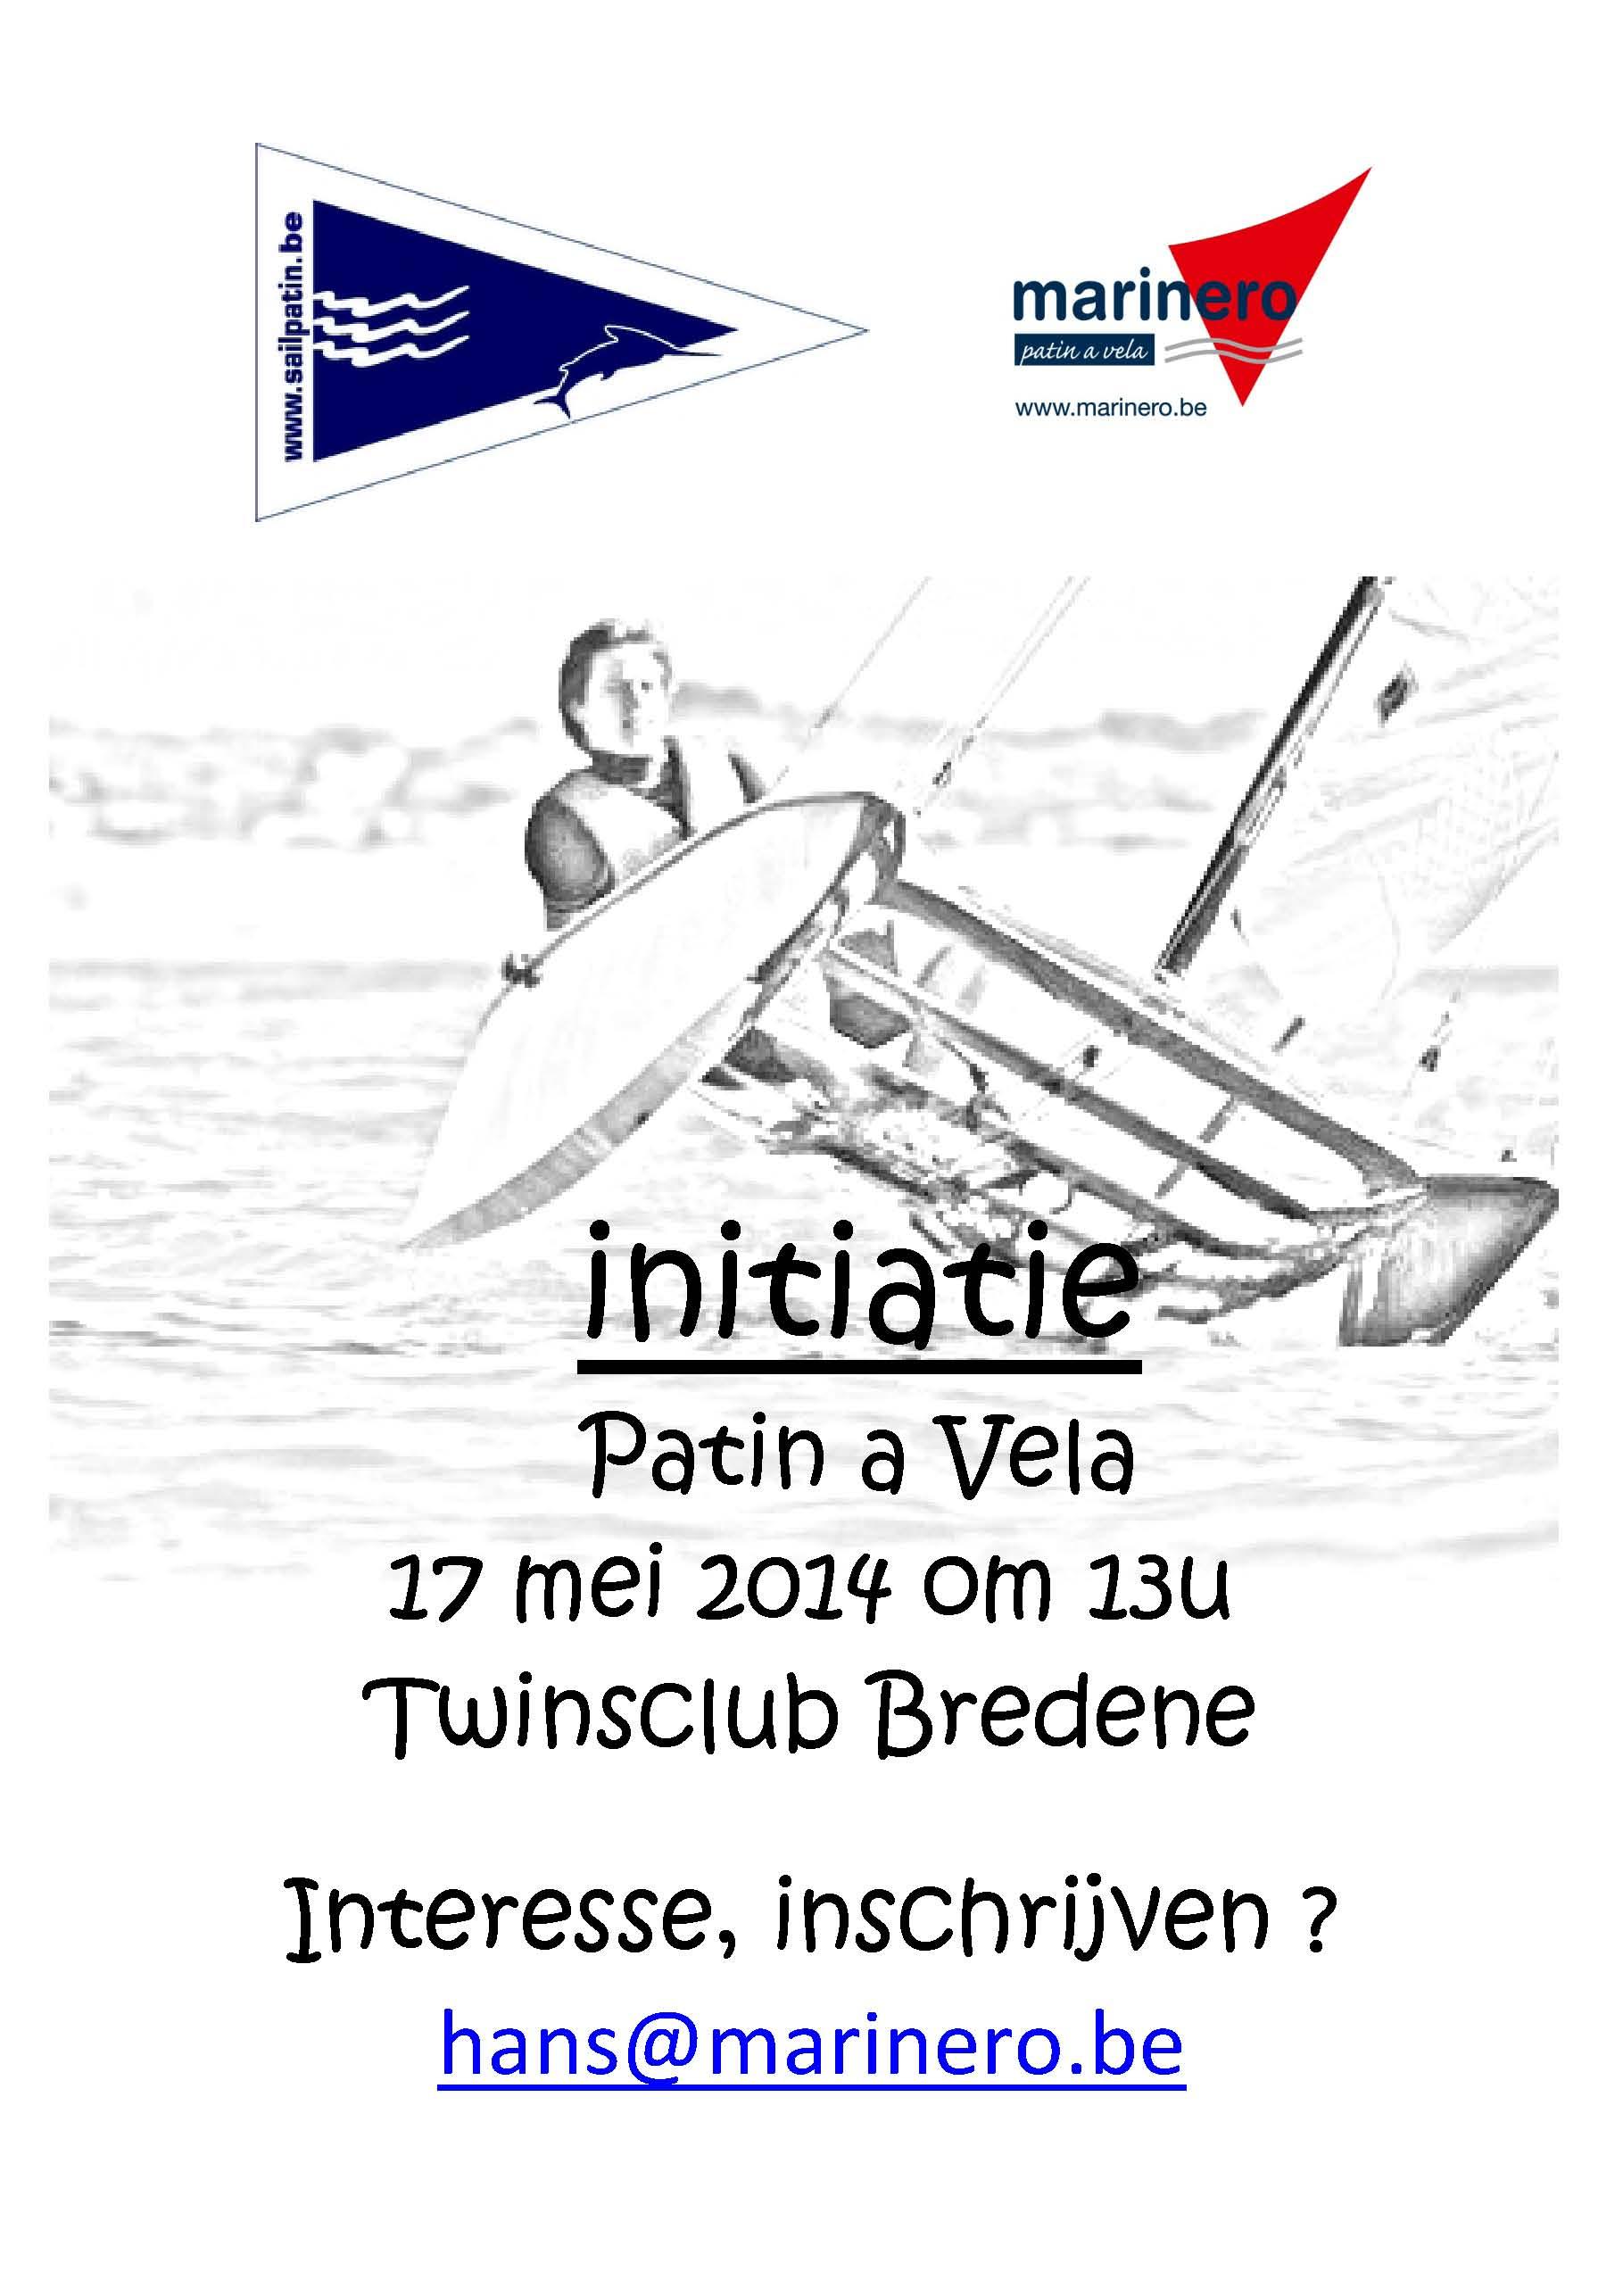 initiatie_affiche_2014